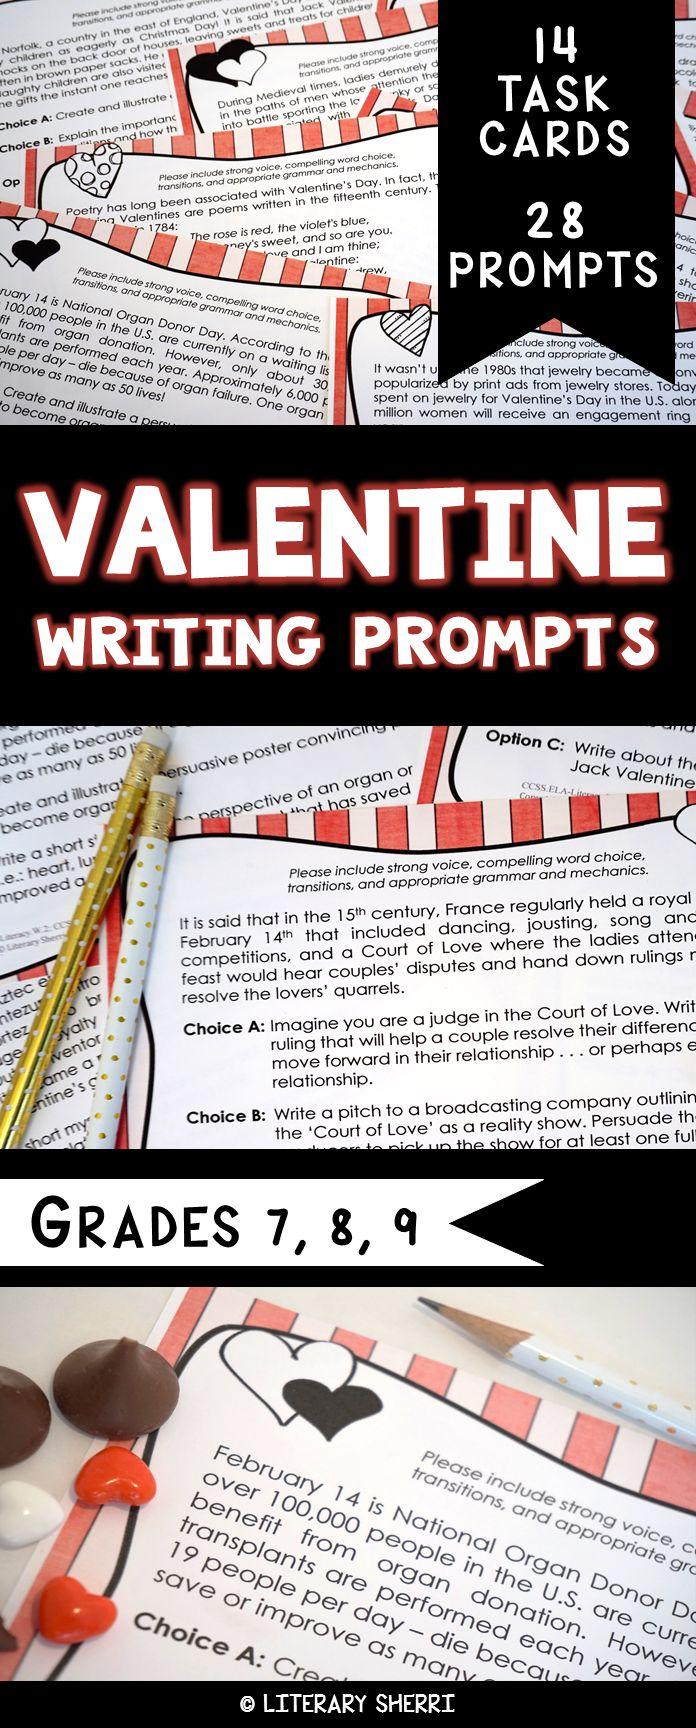 writing prompts   Writing prompts  Website and School Pinterest SMARTePlans Digital To Kill a Mockingbird Rhetorical Analysis  Teaching LiteratureHigh  School